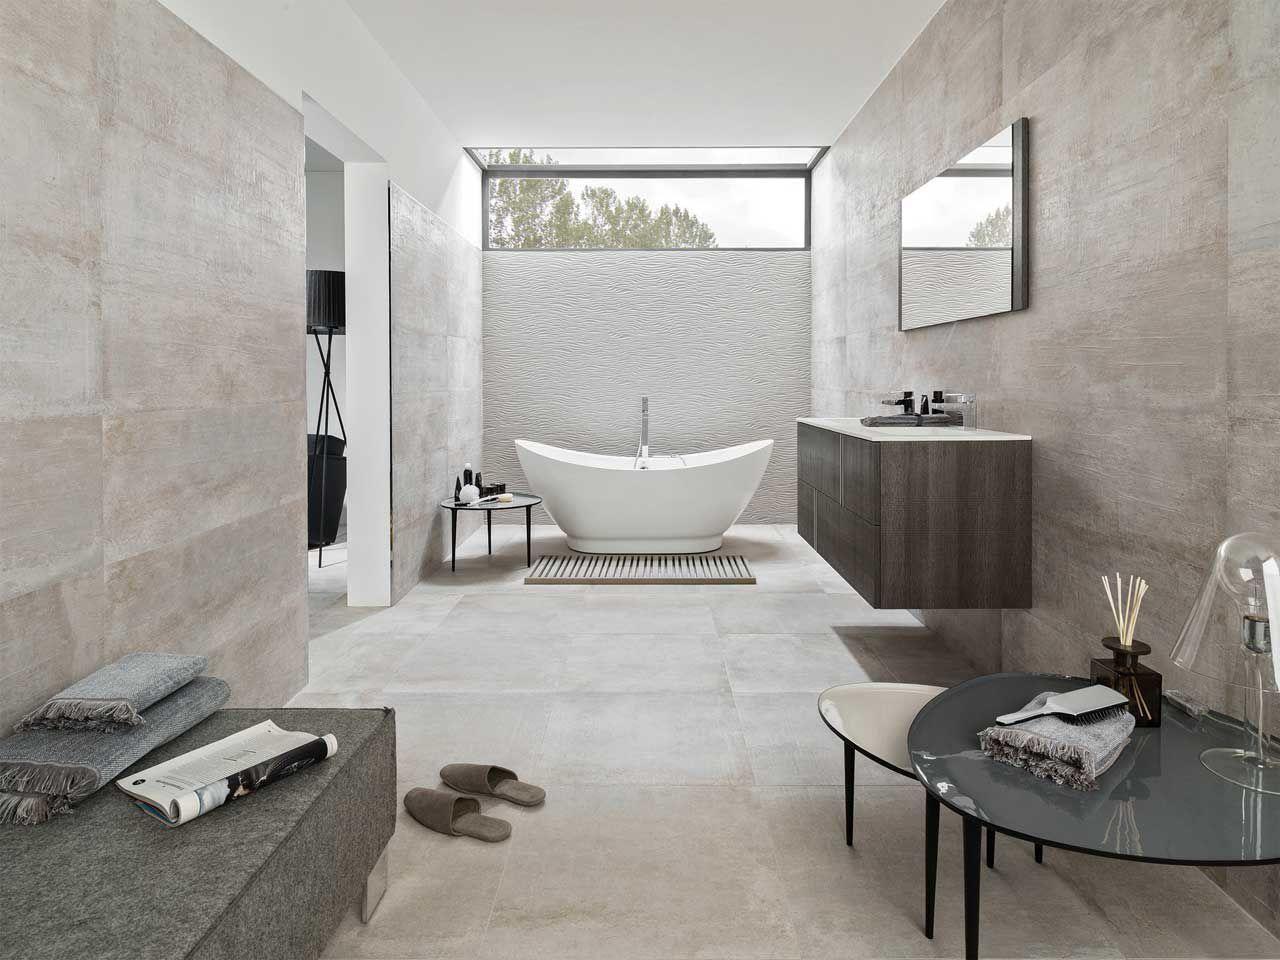 Baldosa de baño / de pared / de cerámica / pulida NEWPORT GRAY ...